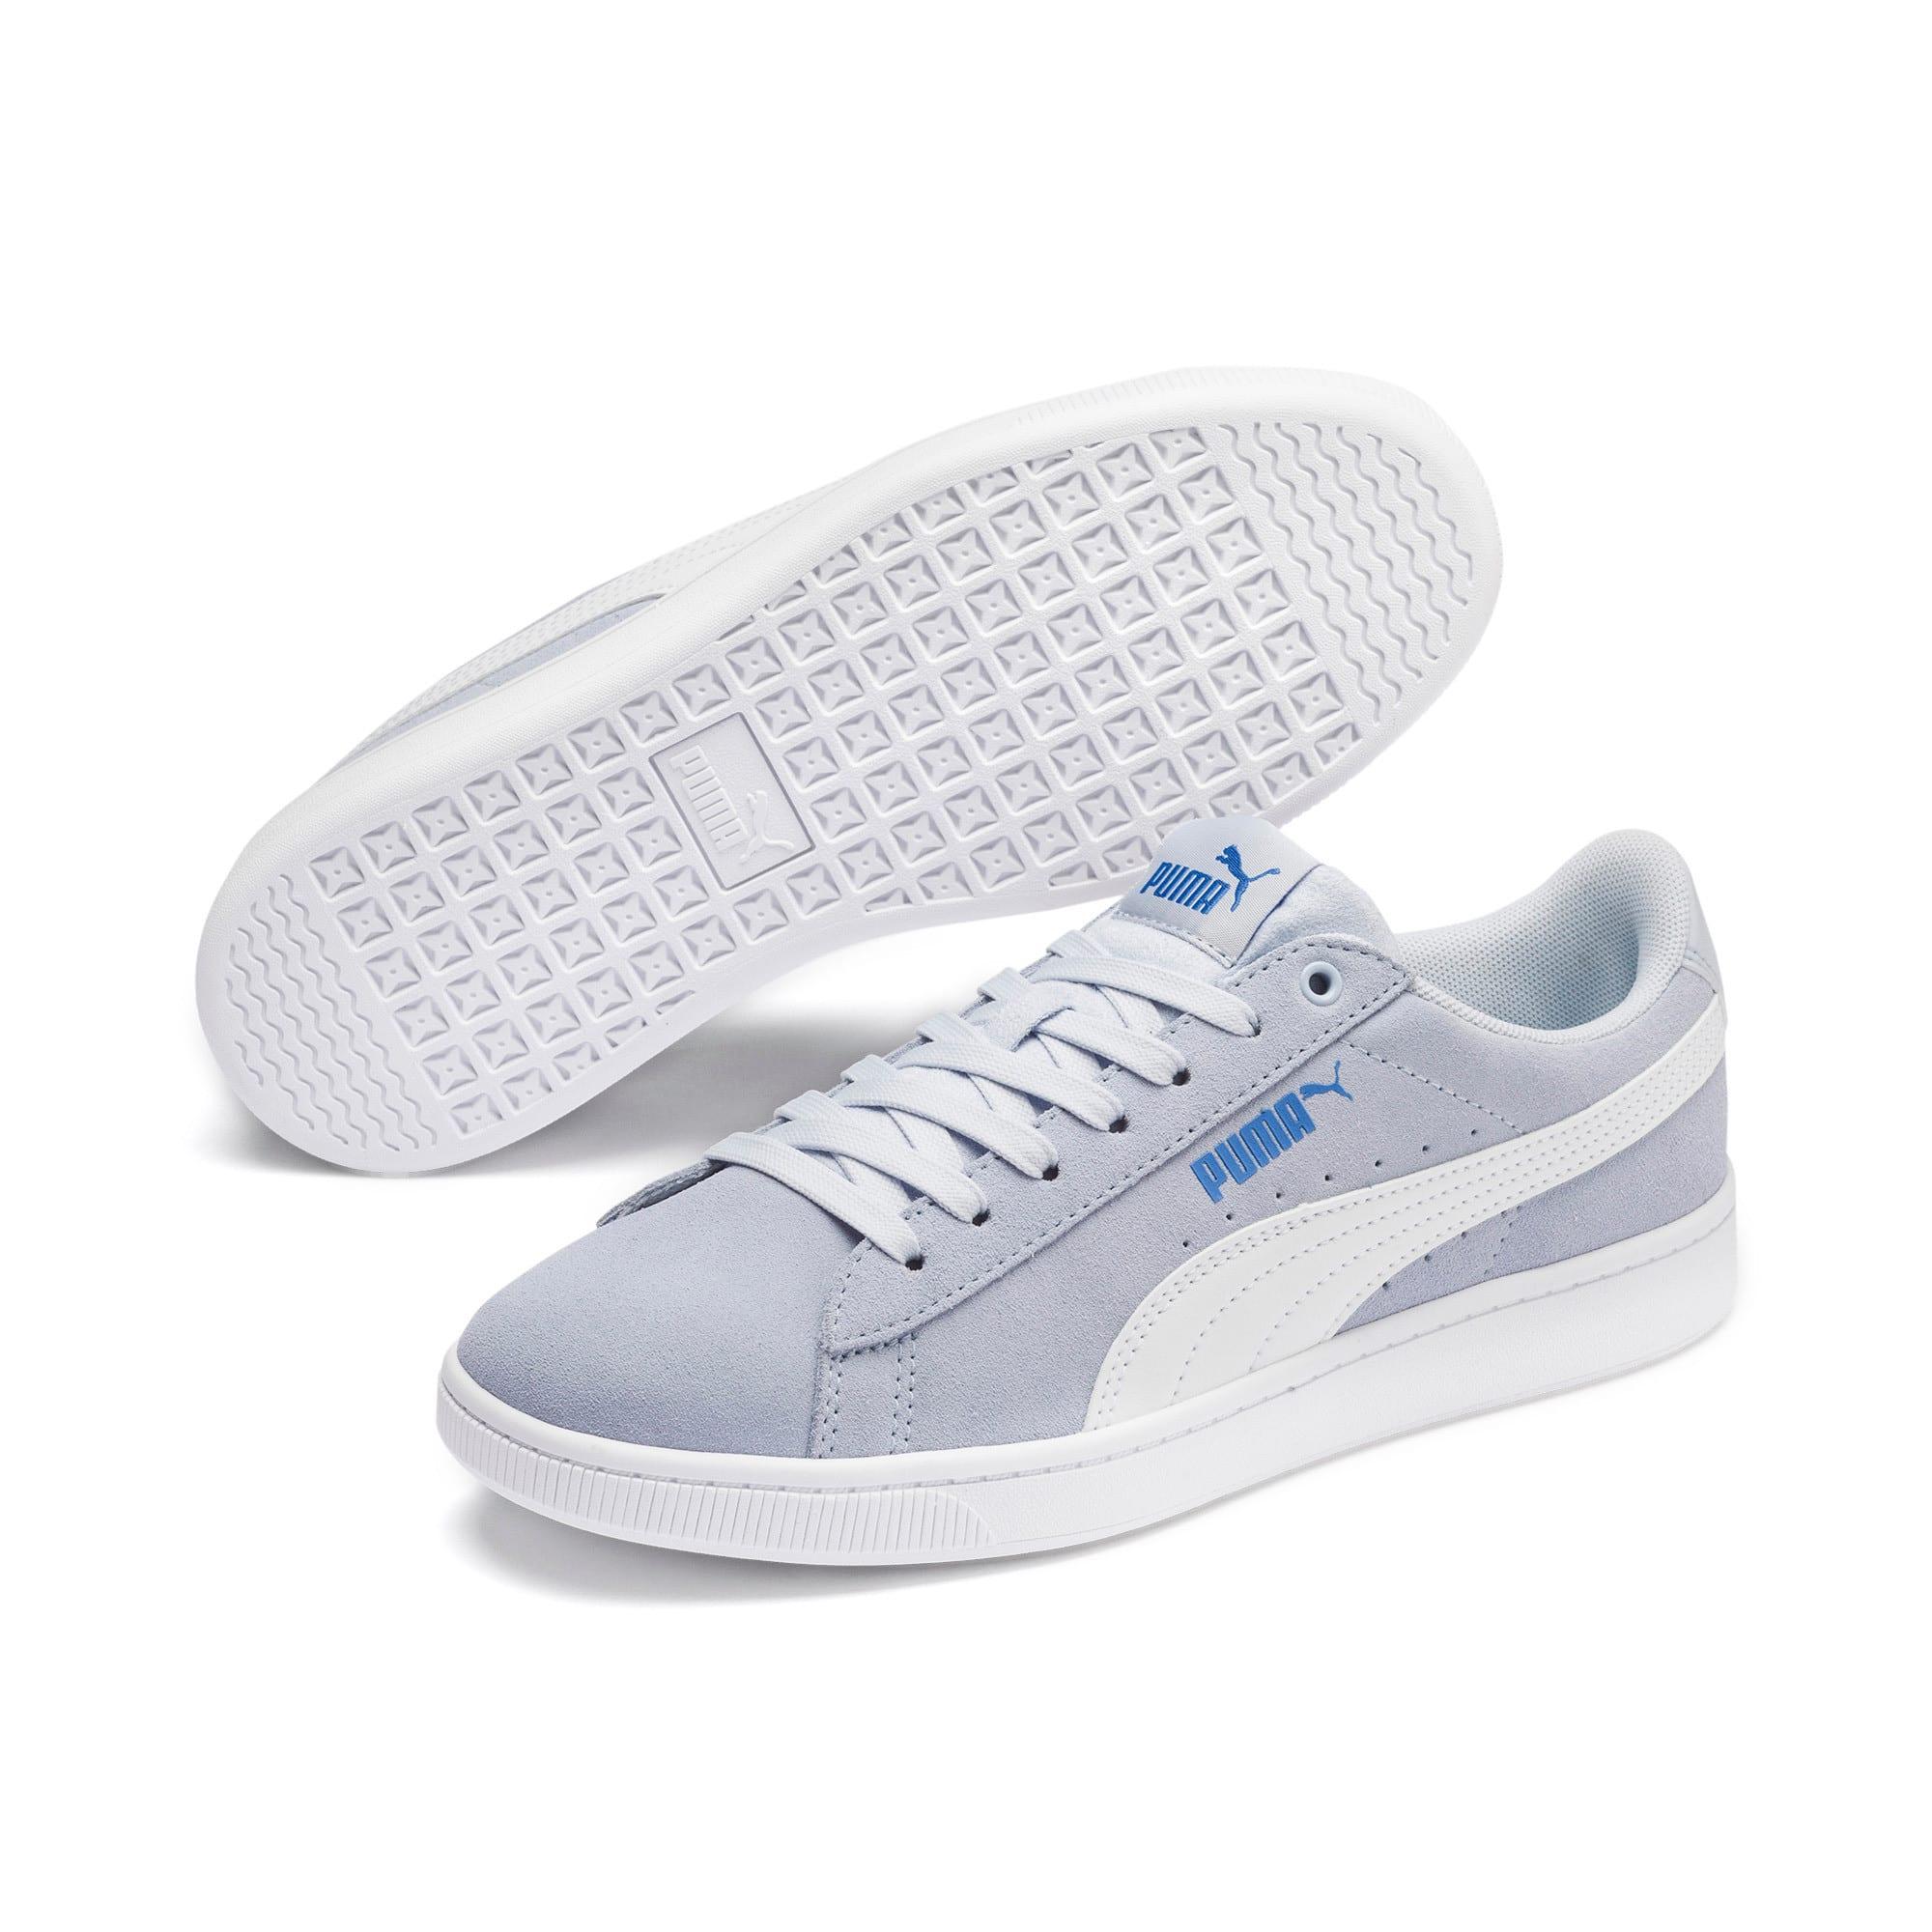 Thumbnail 2 of PUMA Vikky v2 Women's Sneakers, Heather-Ultramarine-White, medium